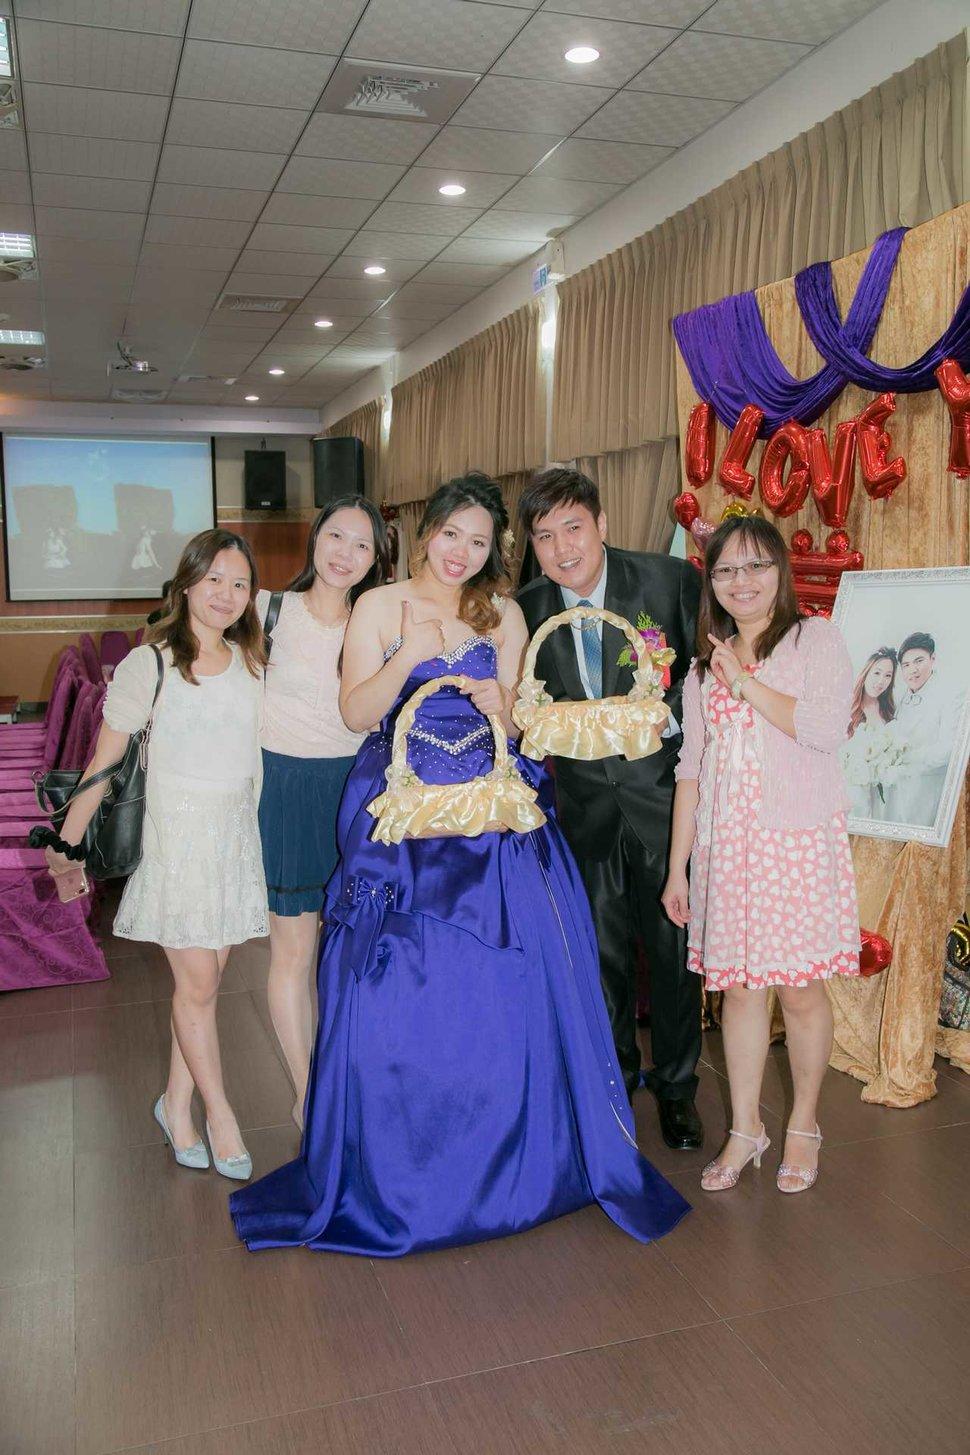 Wedding_Photo_2016_030 - 婚禮攝影師皓溫-婚攝Hoan《結婚吧》